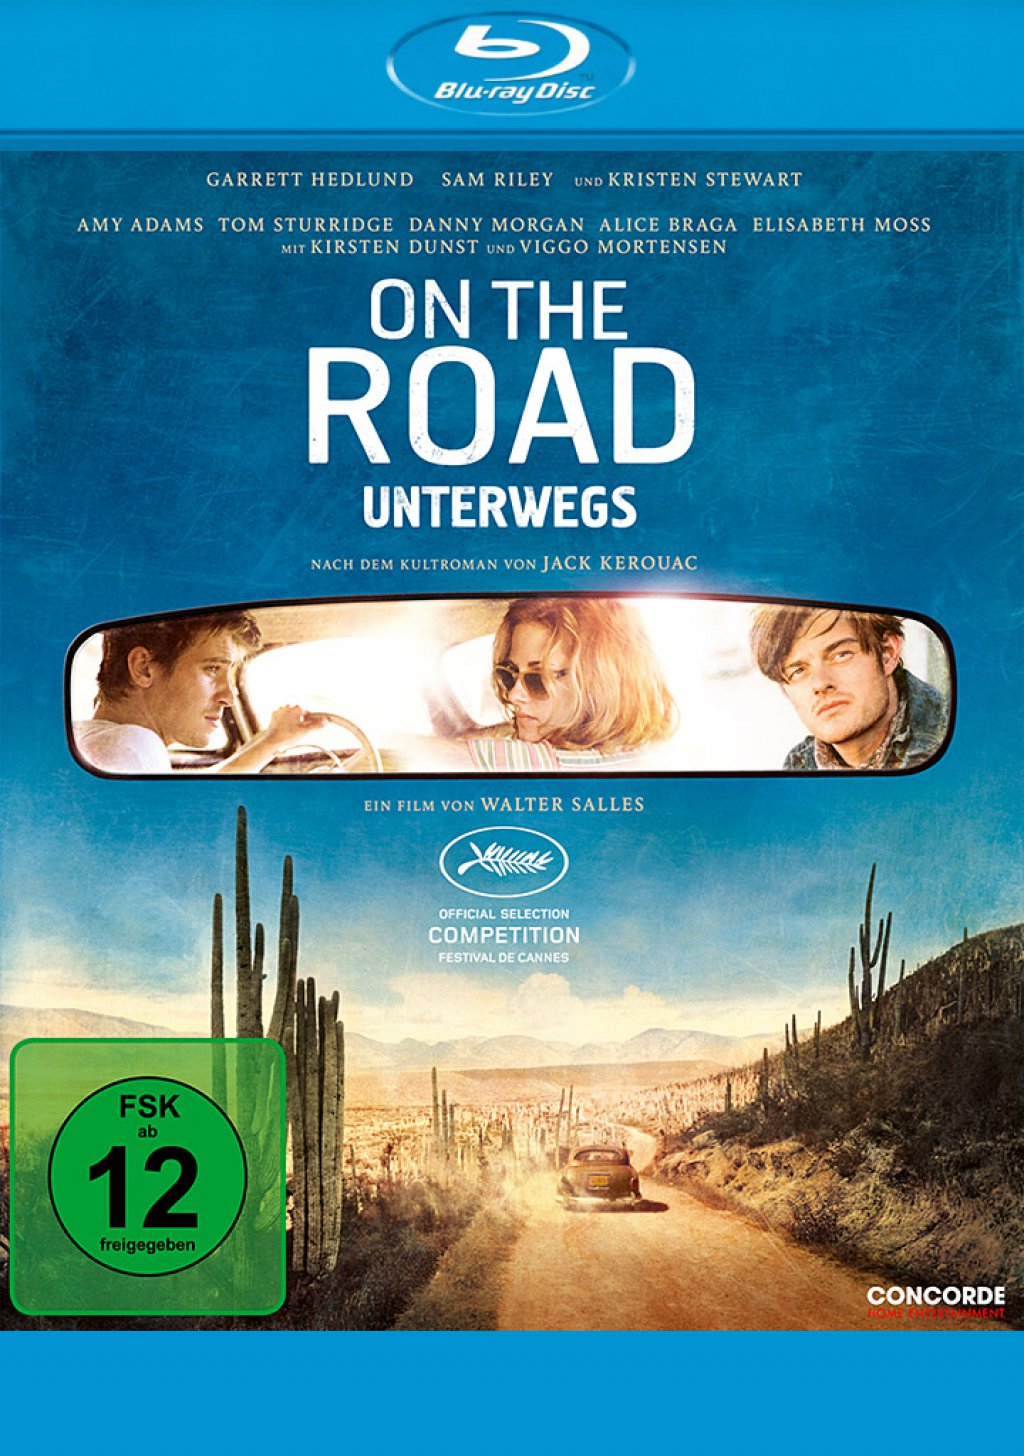 On the Road - Unterwegs (Blu-ray)